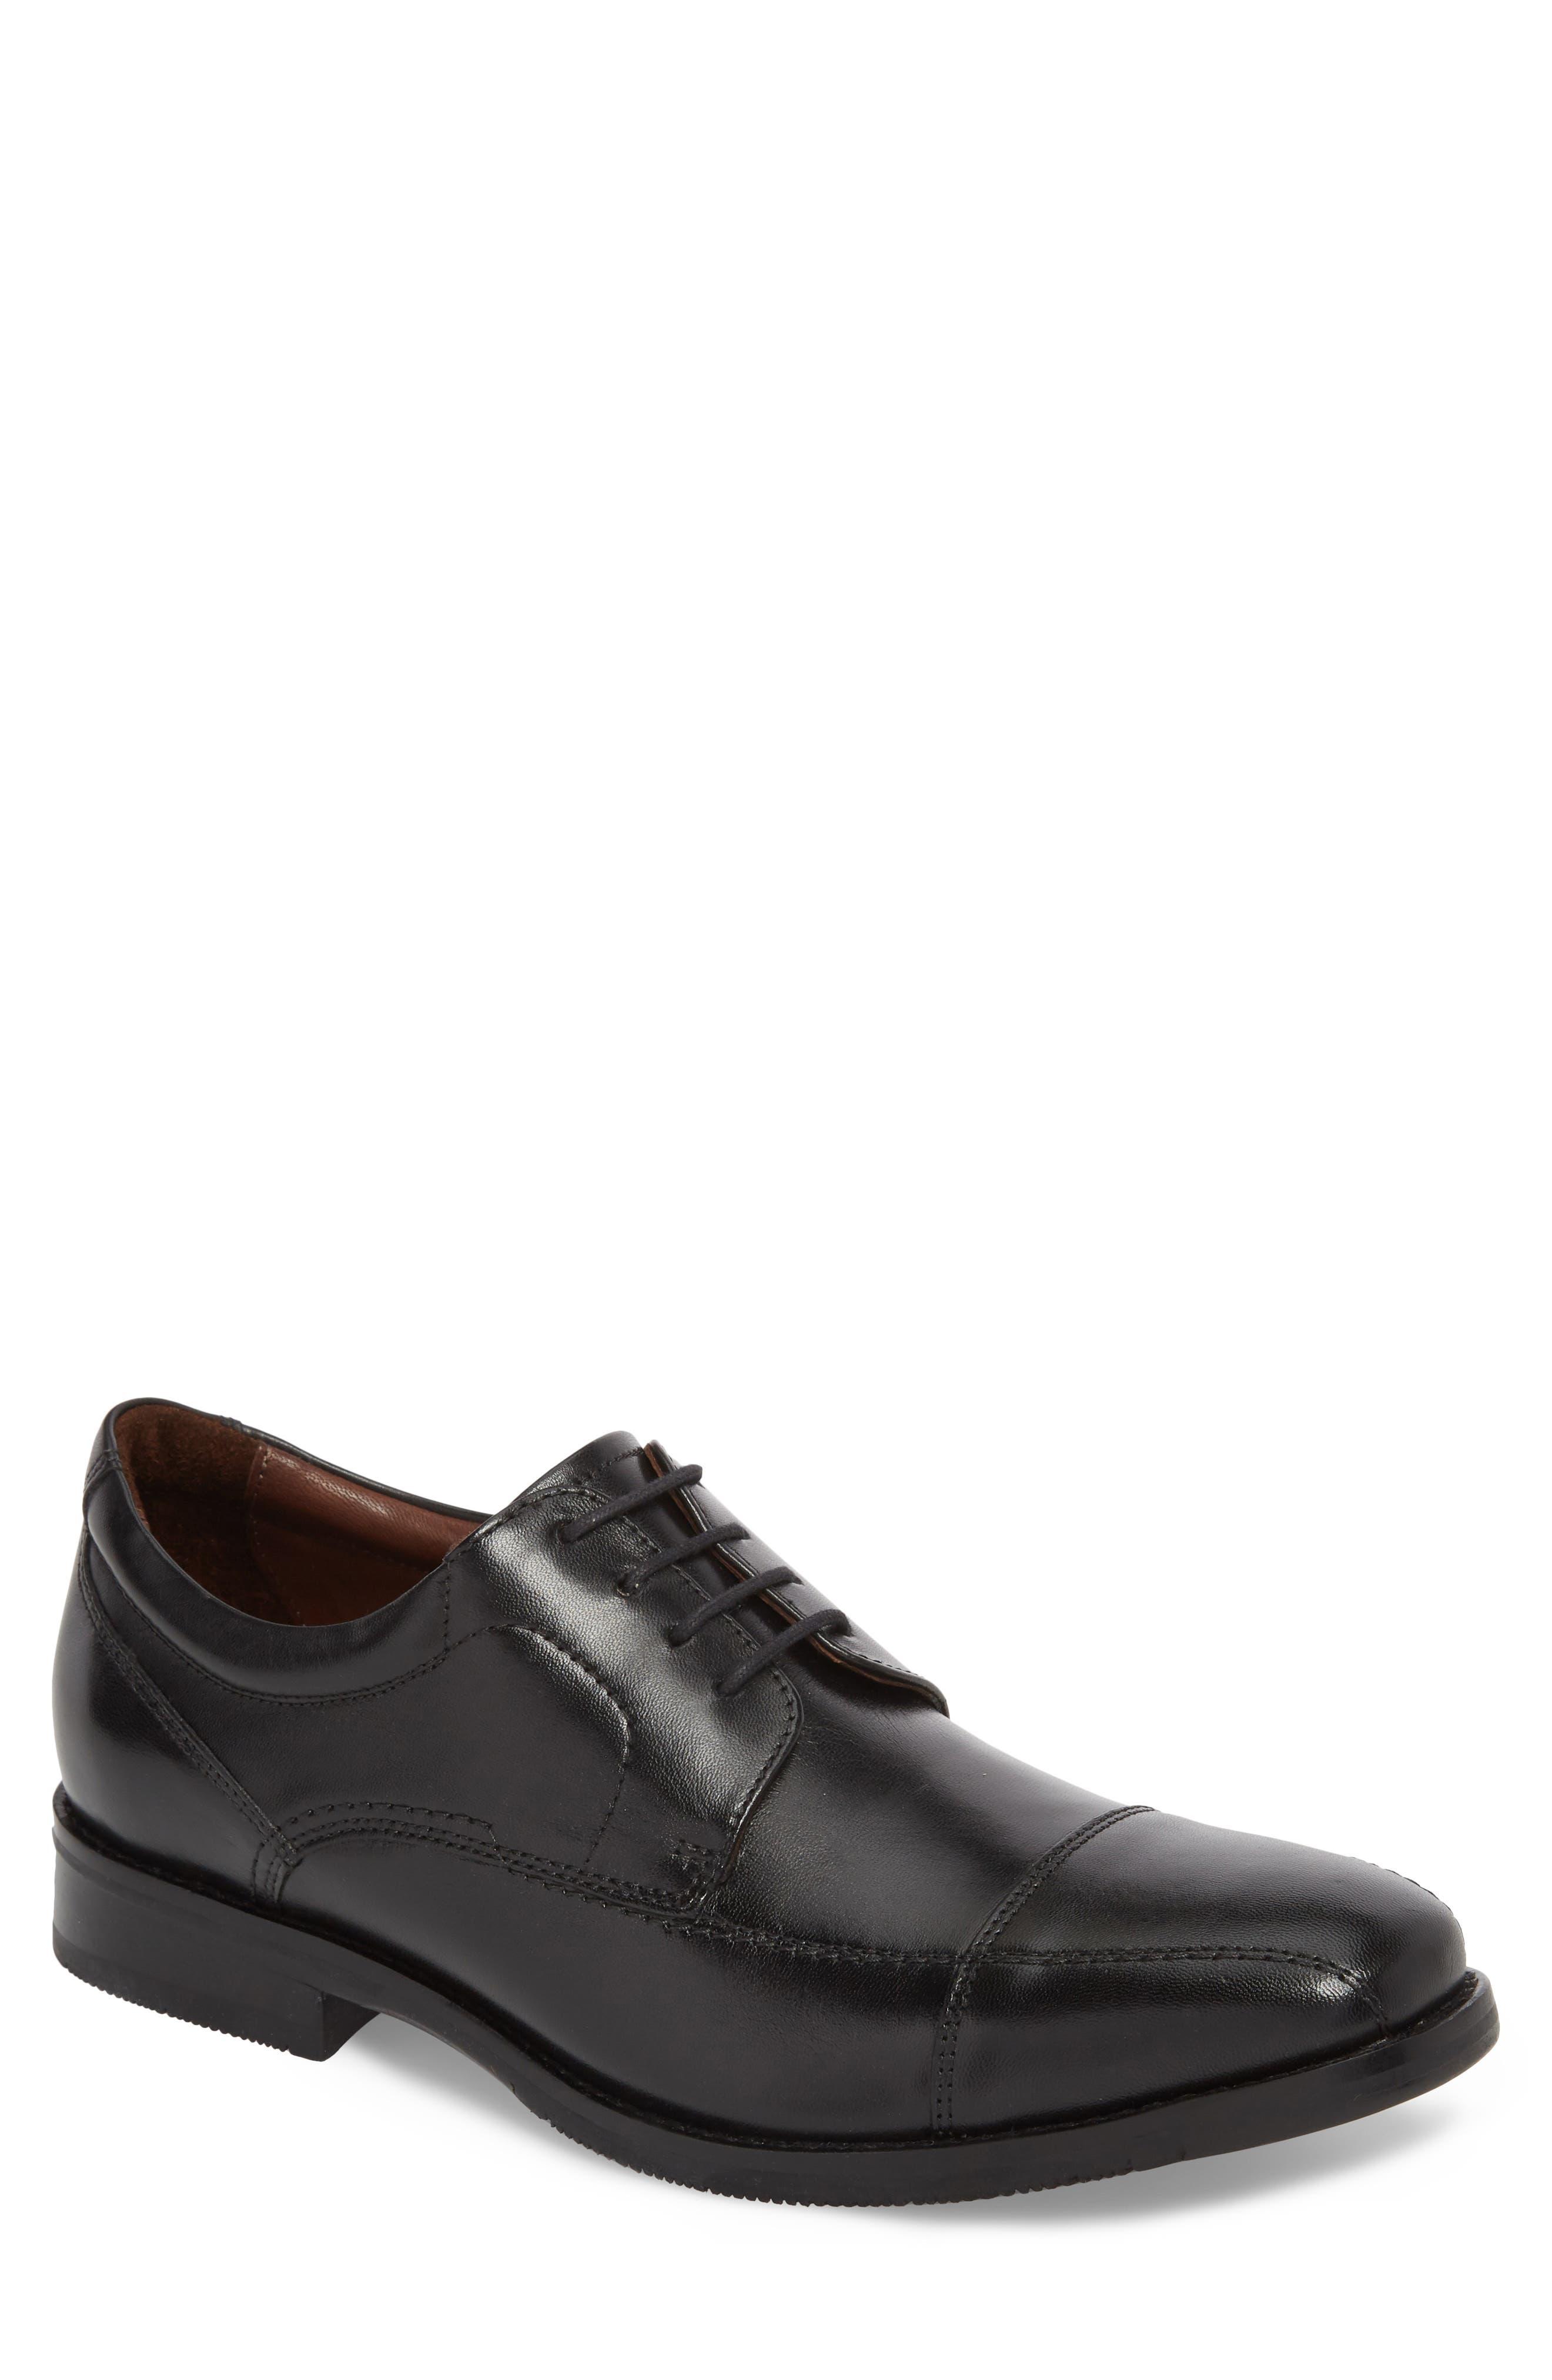 Bartlett Cap Toe Derby,                             Main thumbnail 1, color,                             Black Leather